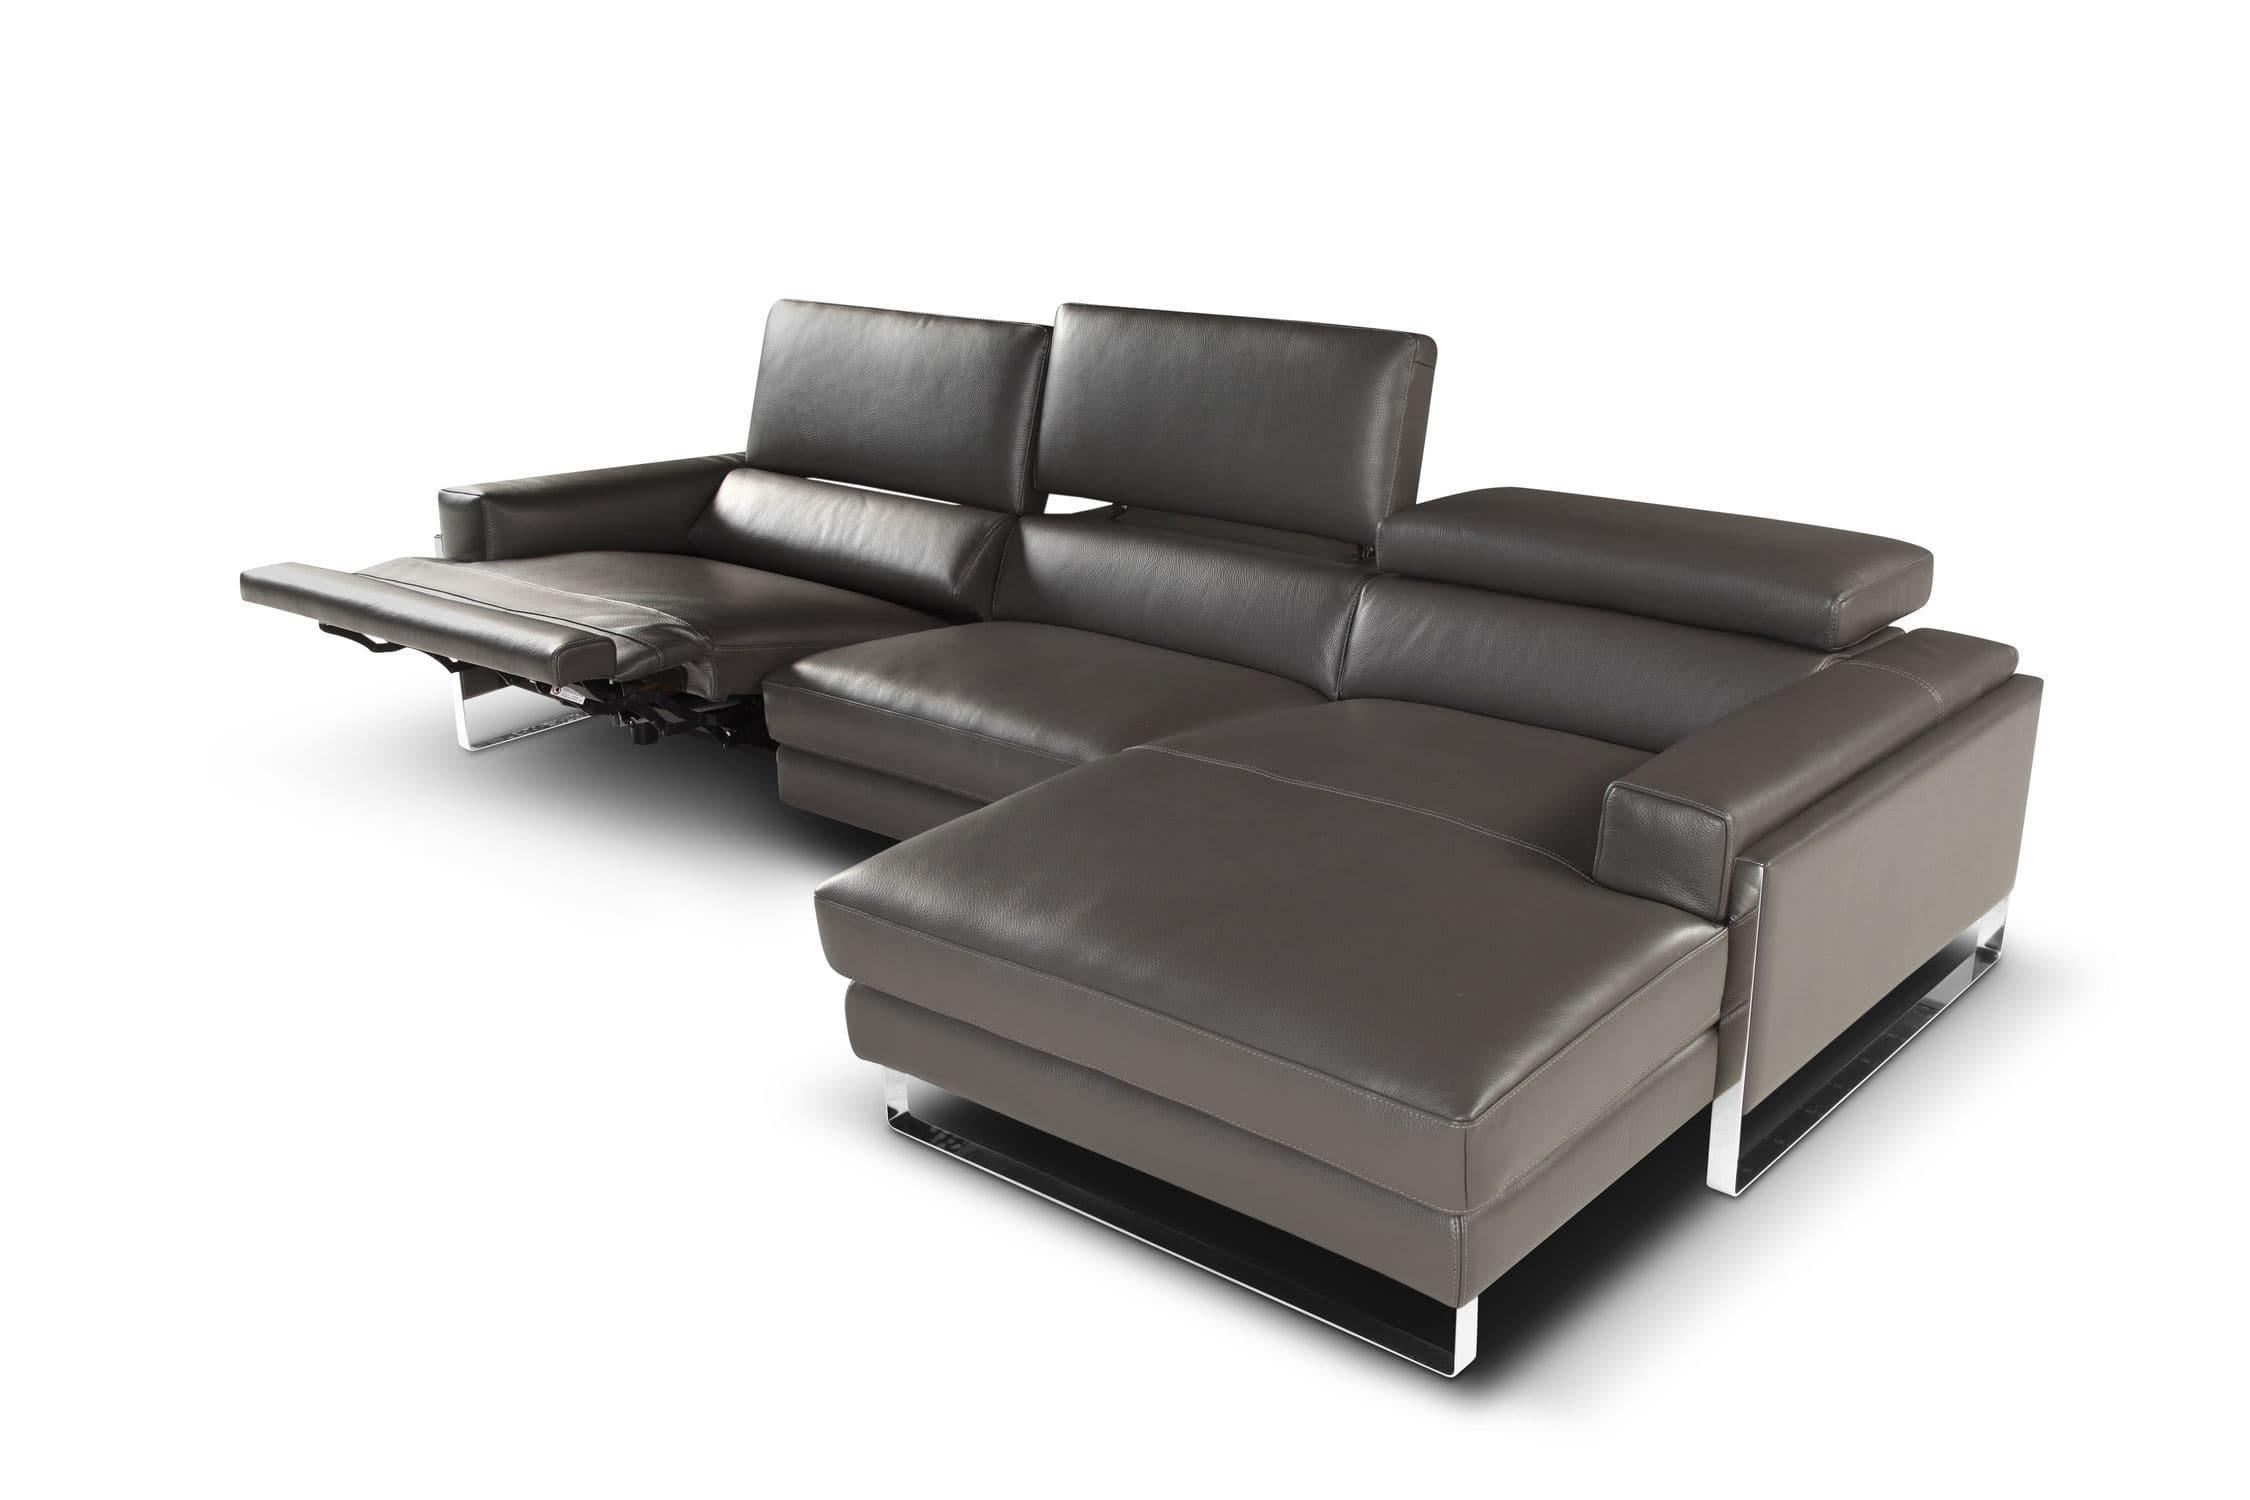 Modular sofa original design leather 3 seater ROMEO RELAX